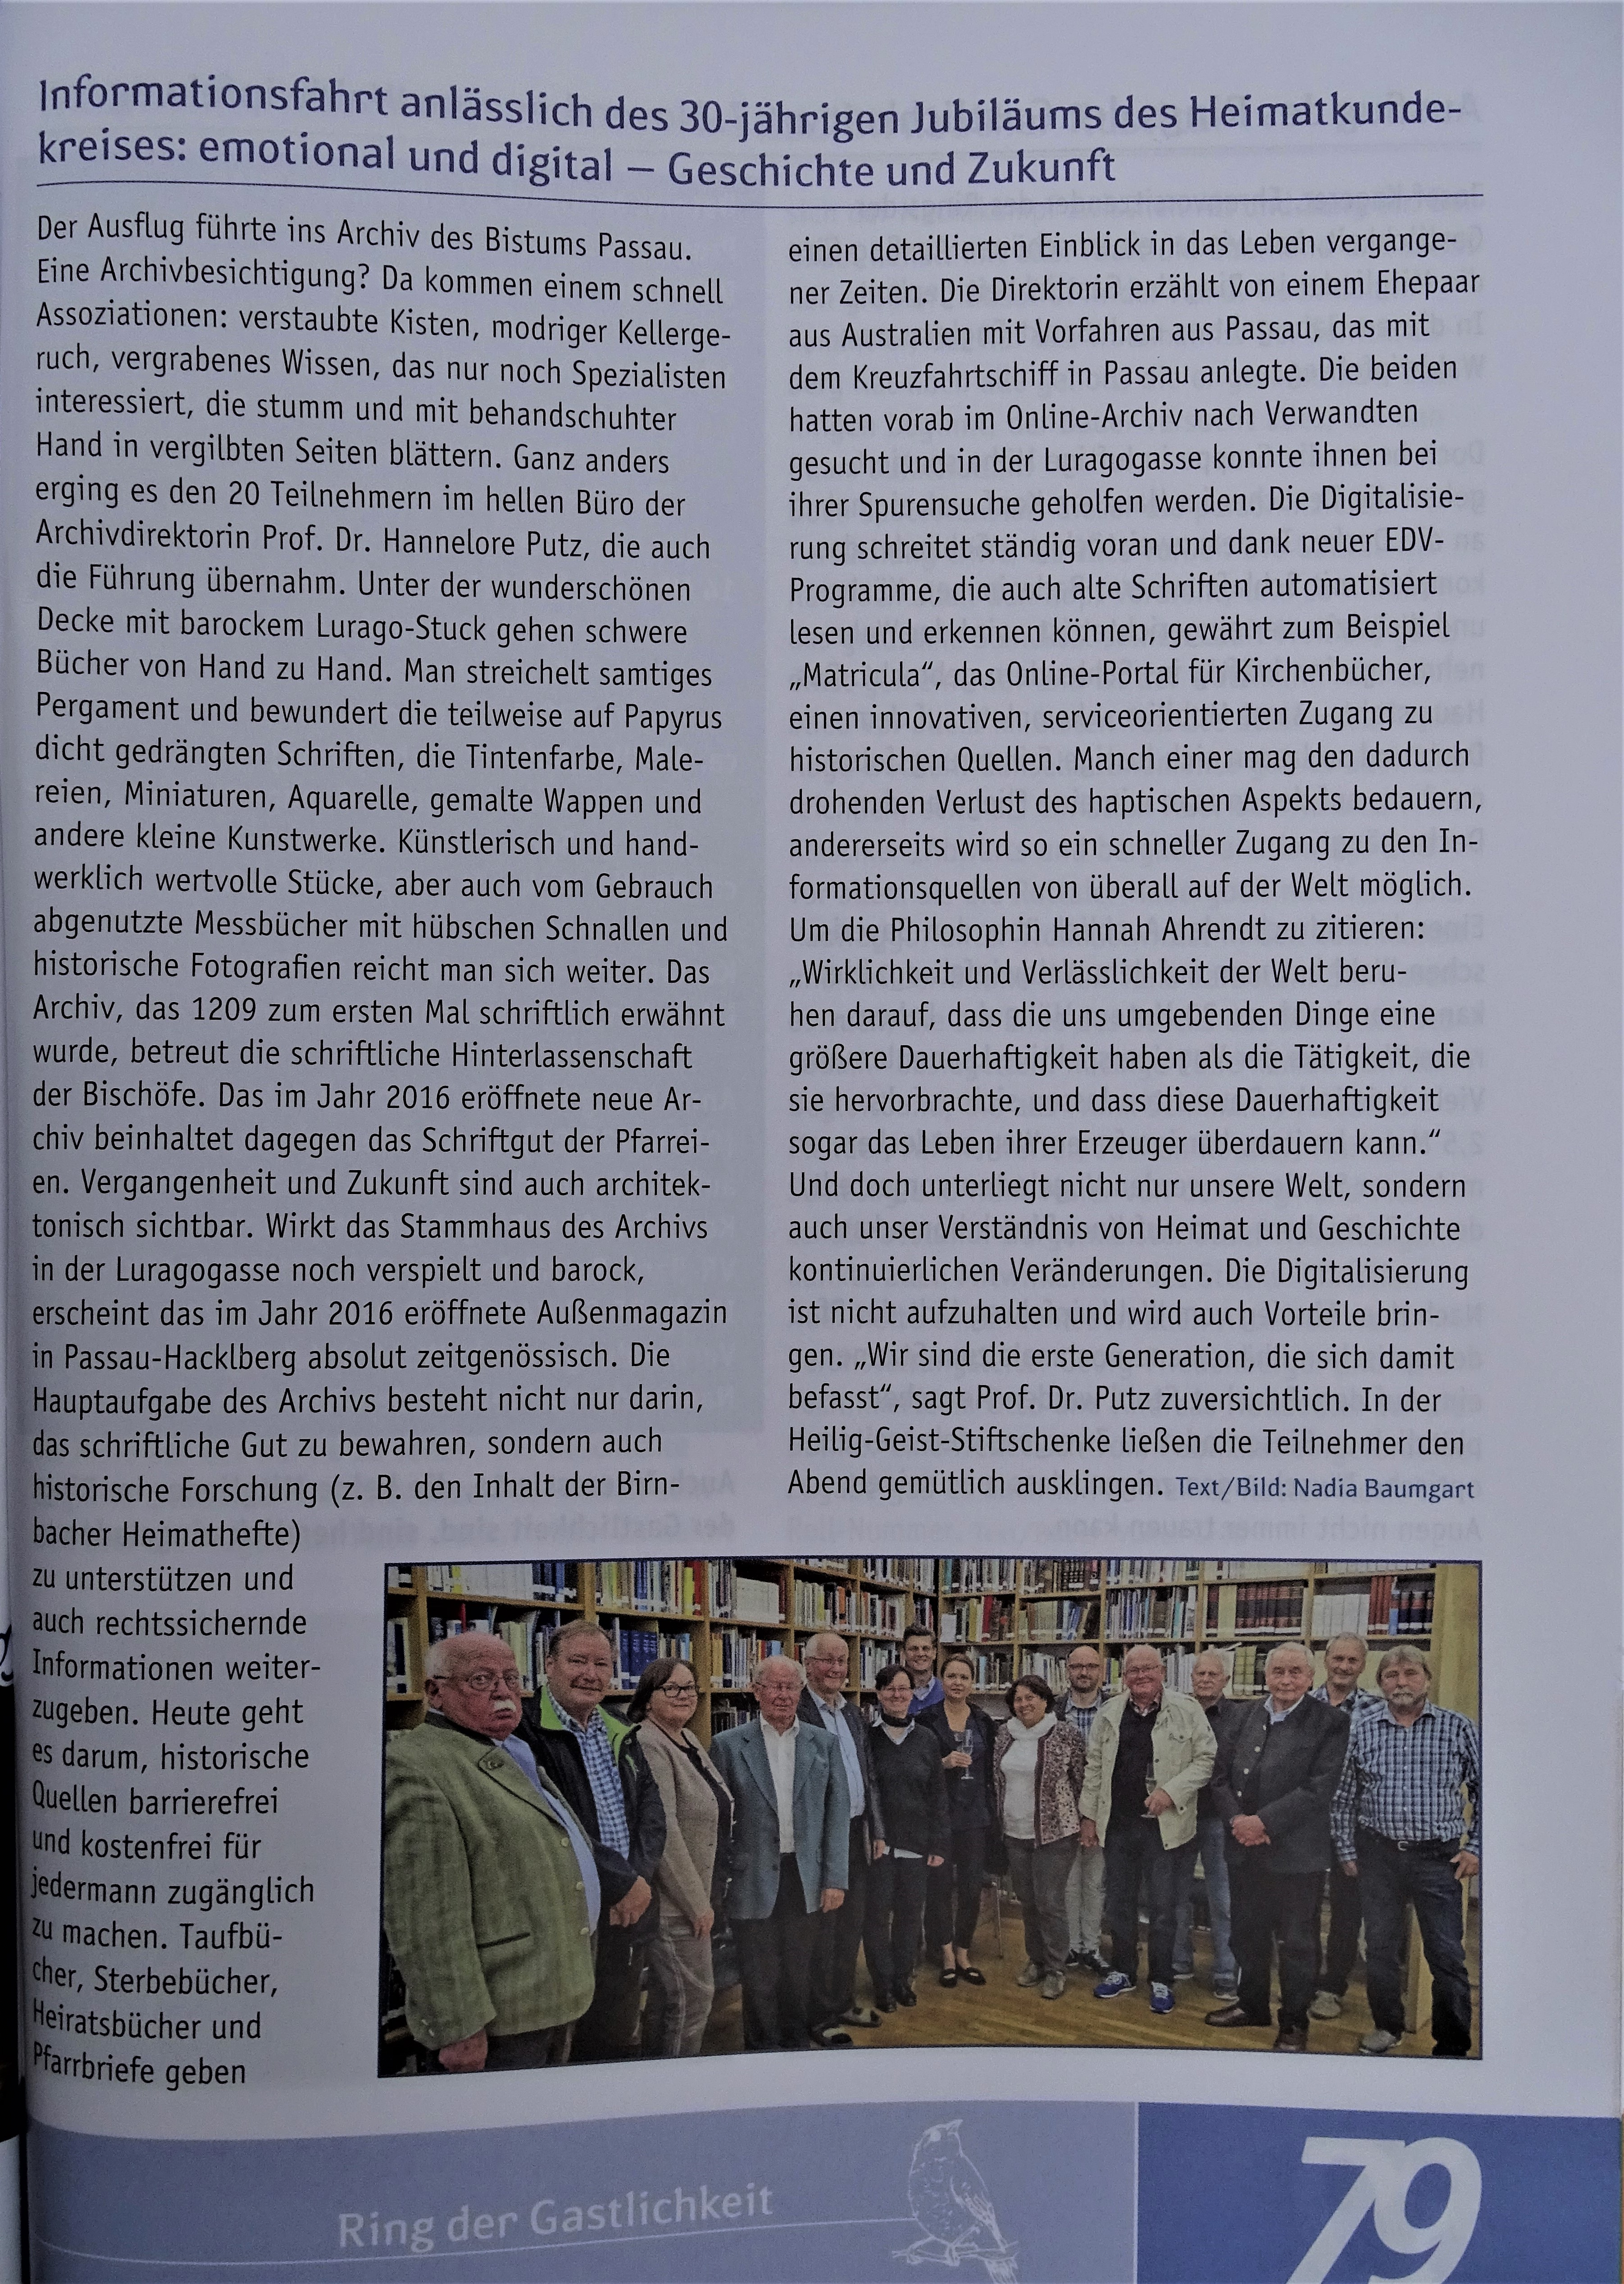 Kurspatz_Heimatkundekreis_Bad_Birnbach_Nadia_Baumgart